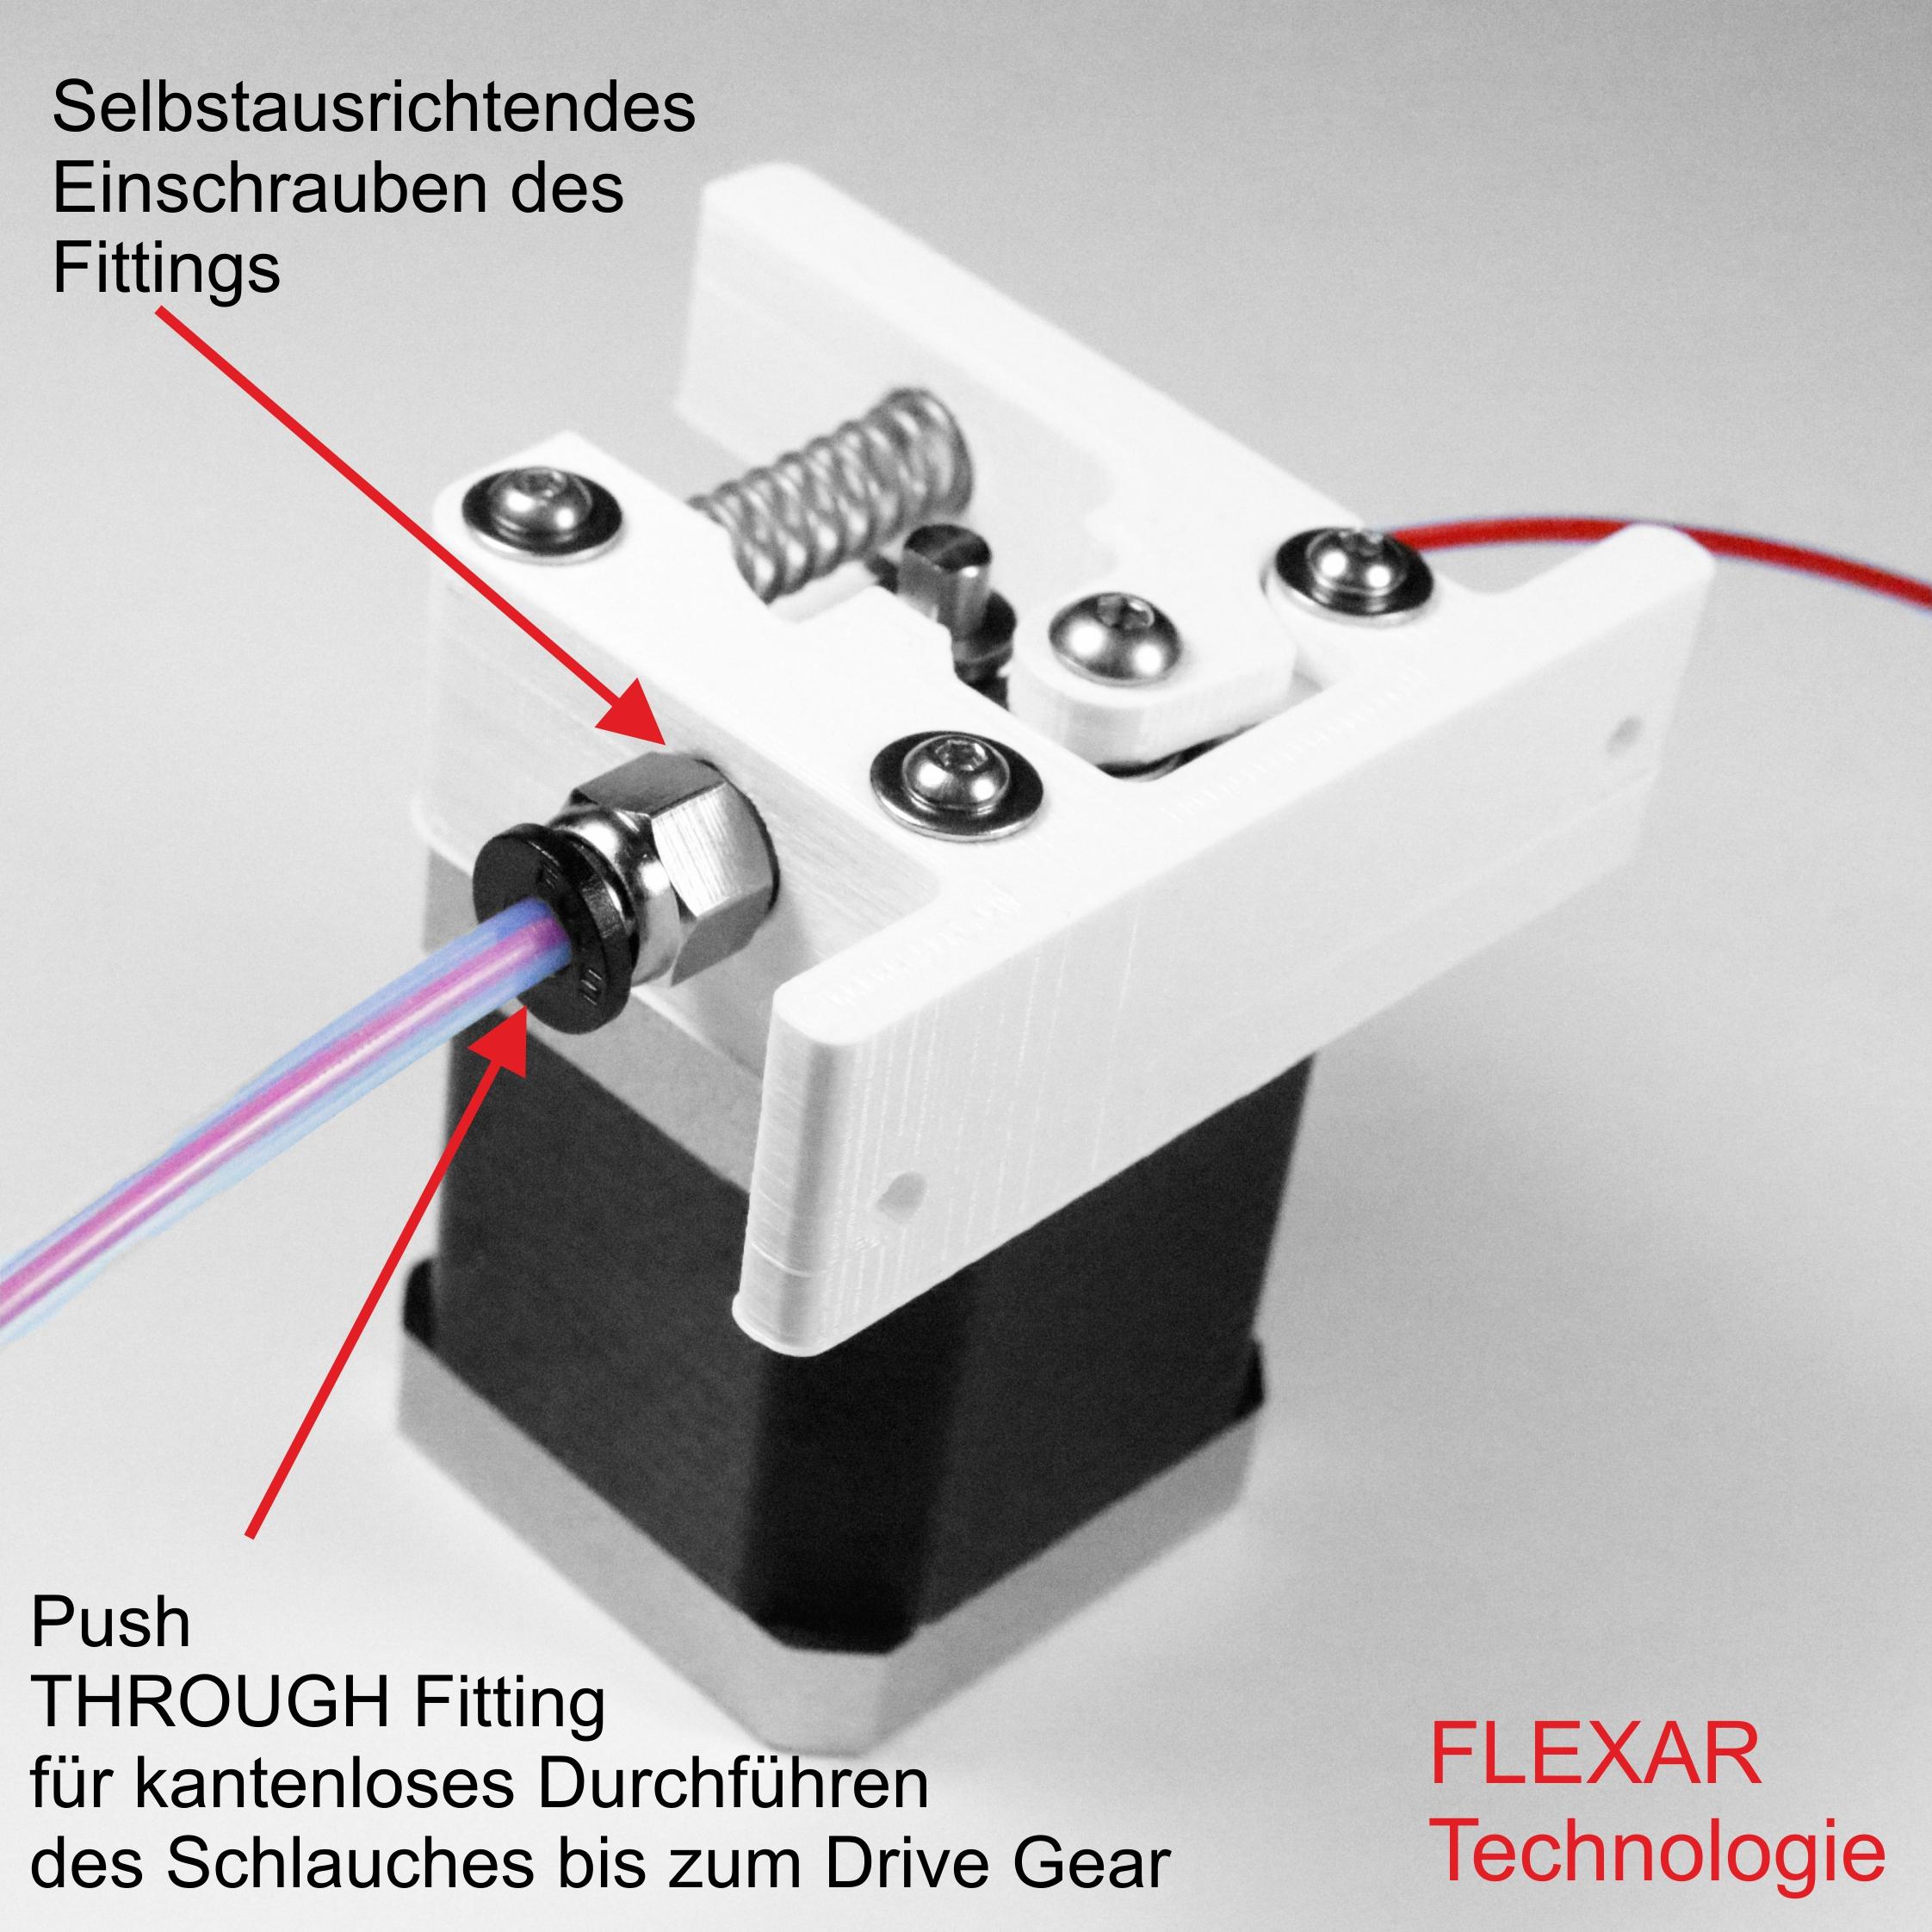 simple-flexar-extruder-eigenschaften-beschrieben-3